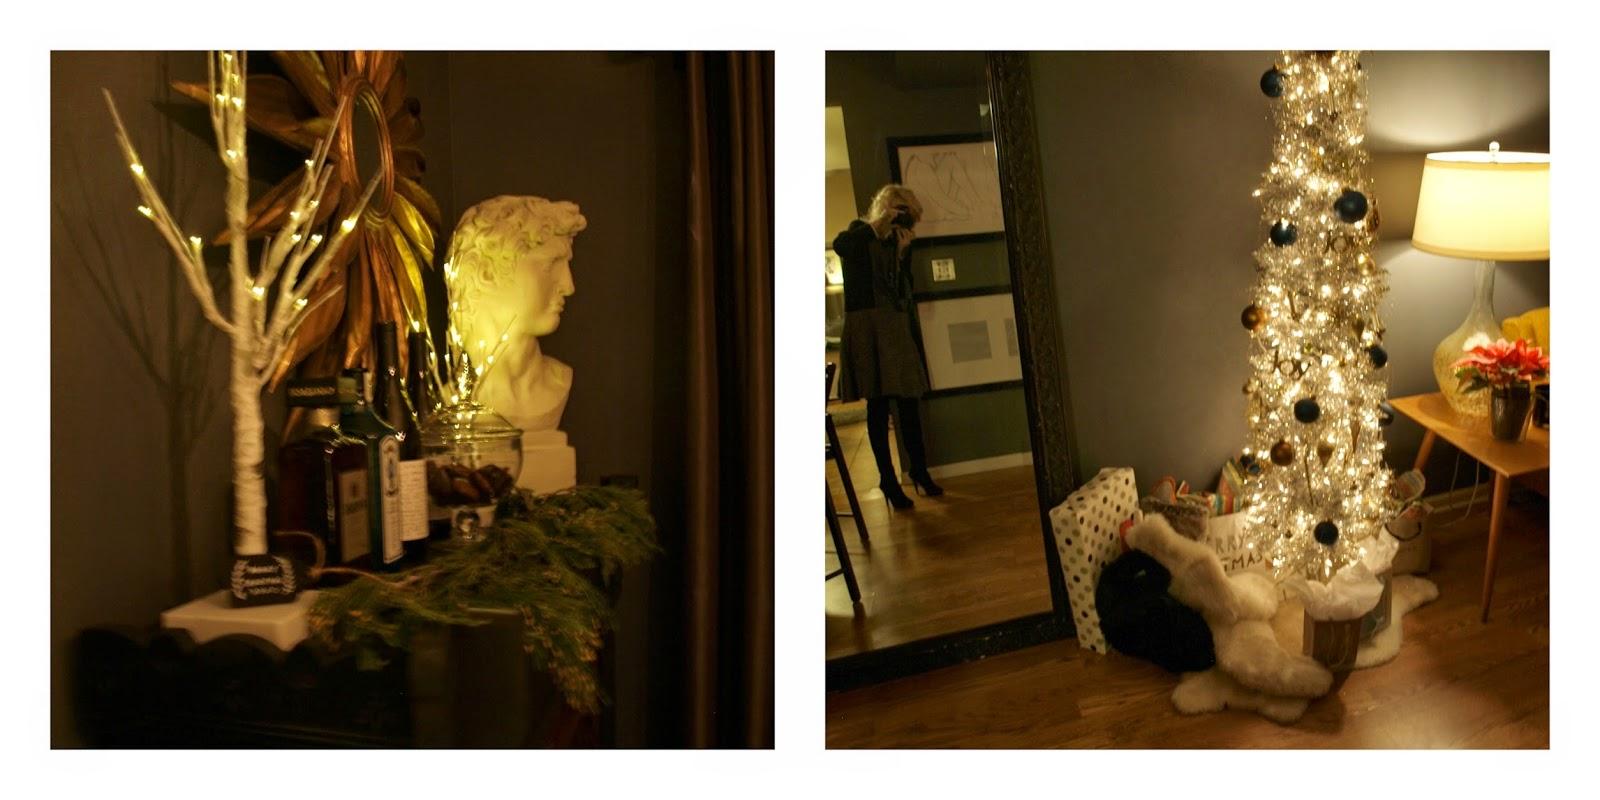 midcentury-modern-christmas-holiday-decor-decorating-piano-hope-hellolovely-hello-lovely-studio